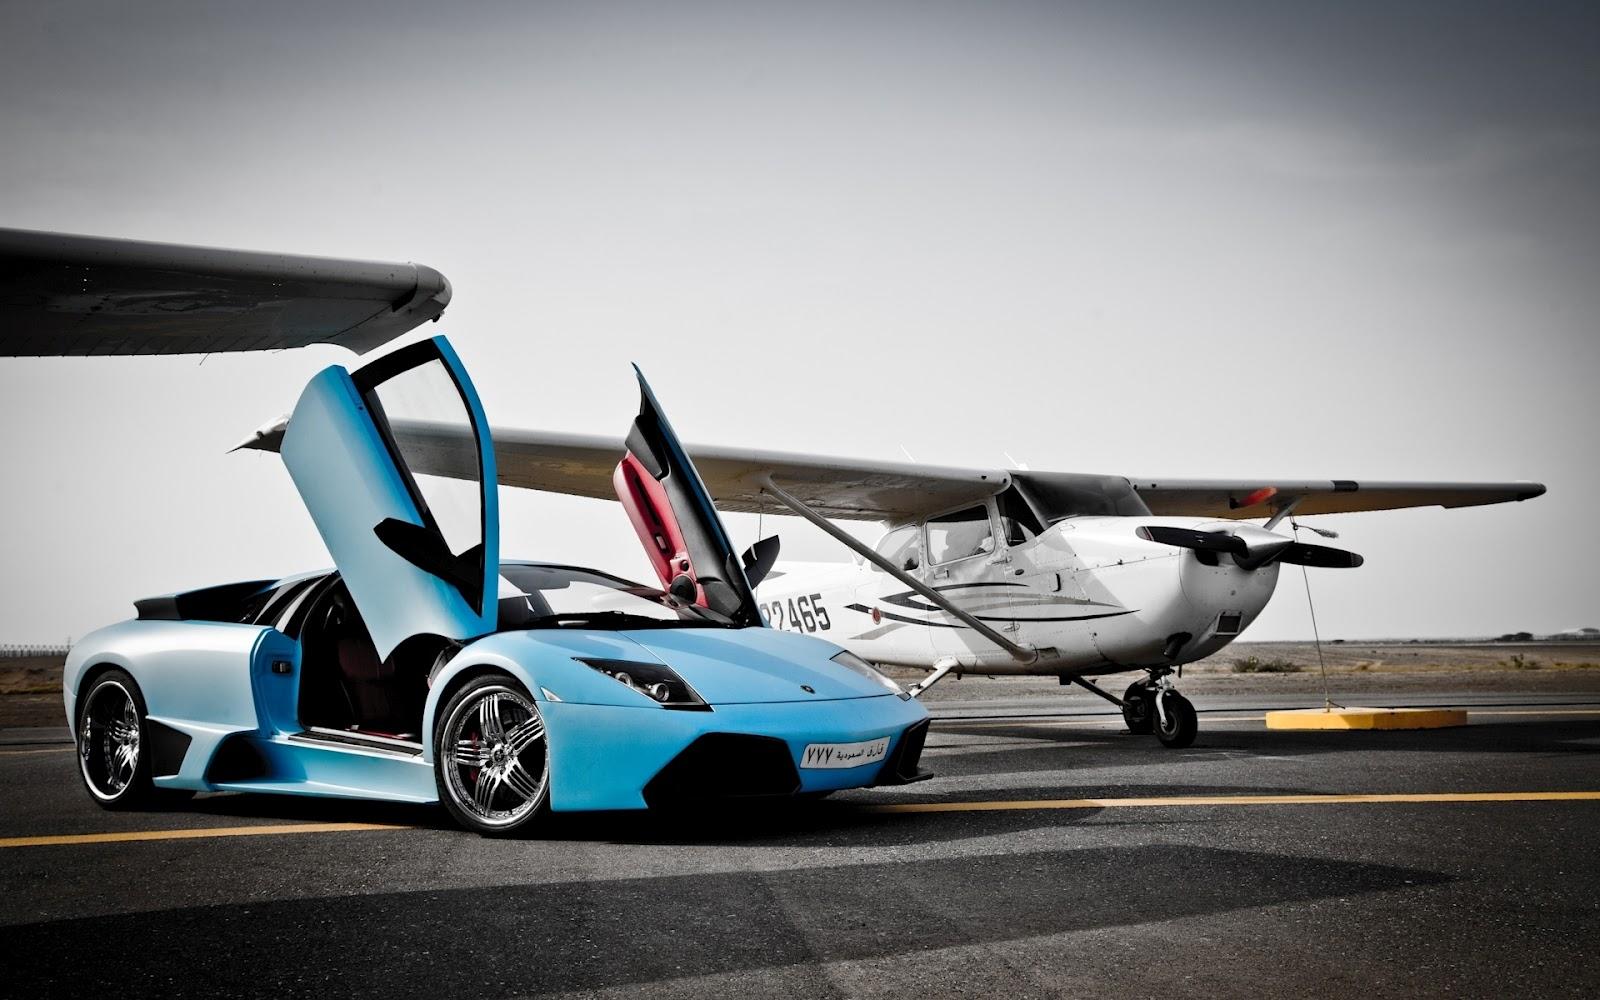 Fondos HD de Carros Deportivos: Lamborghini Murcielago LP640